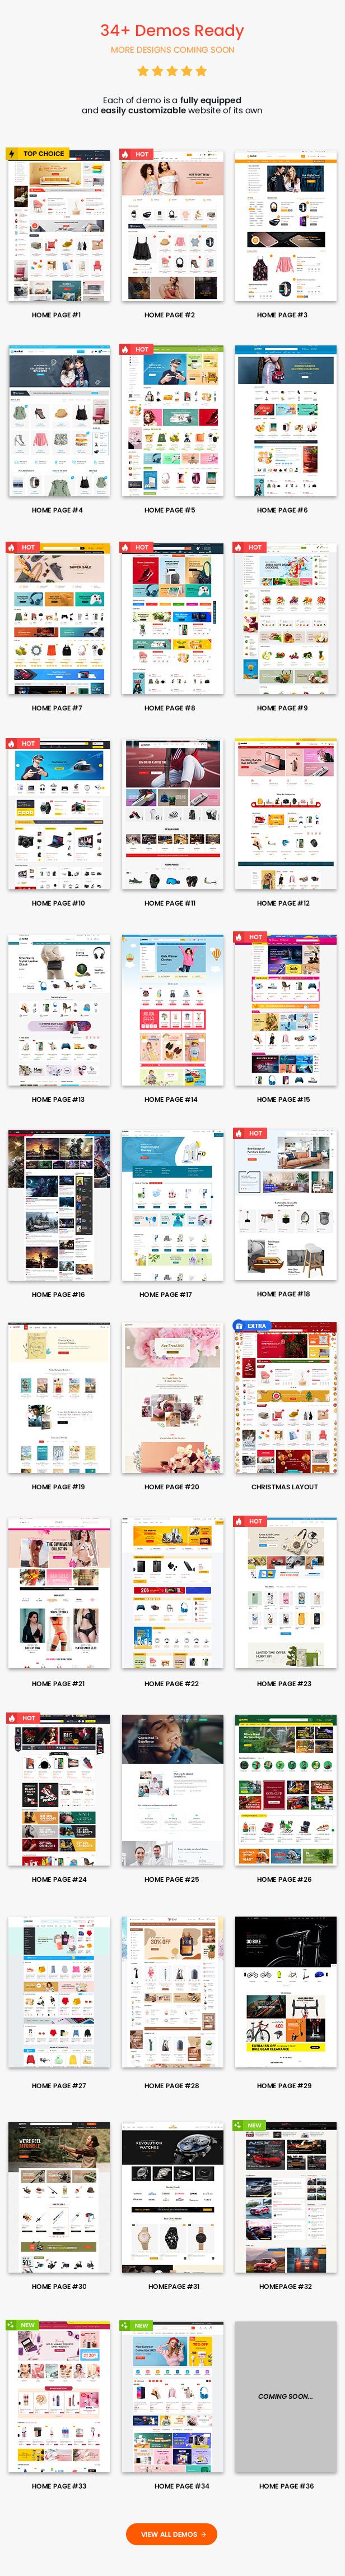 1 emarket multi vendor marketplace elementor woocommerce wordpress theme homepages 460 - eMarket - Multi Vendor MarketPlace Elementor WordPress Theme (34+ Homepages & 3 Mobile Layouts)